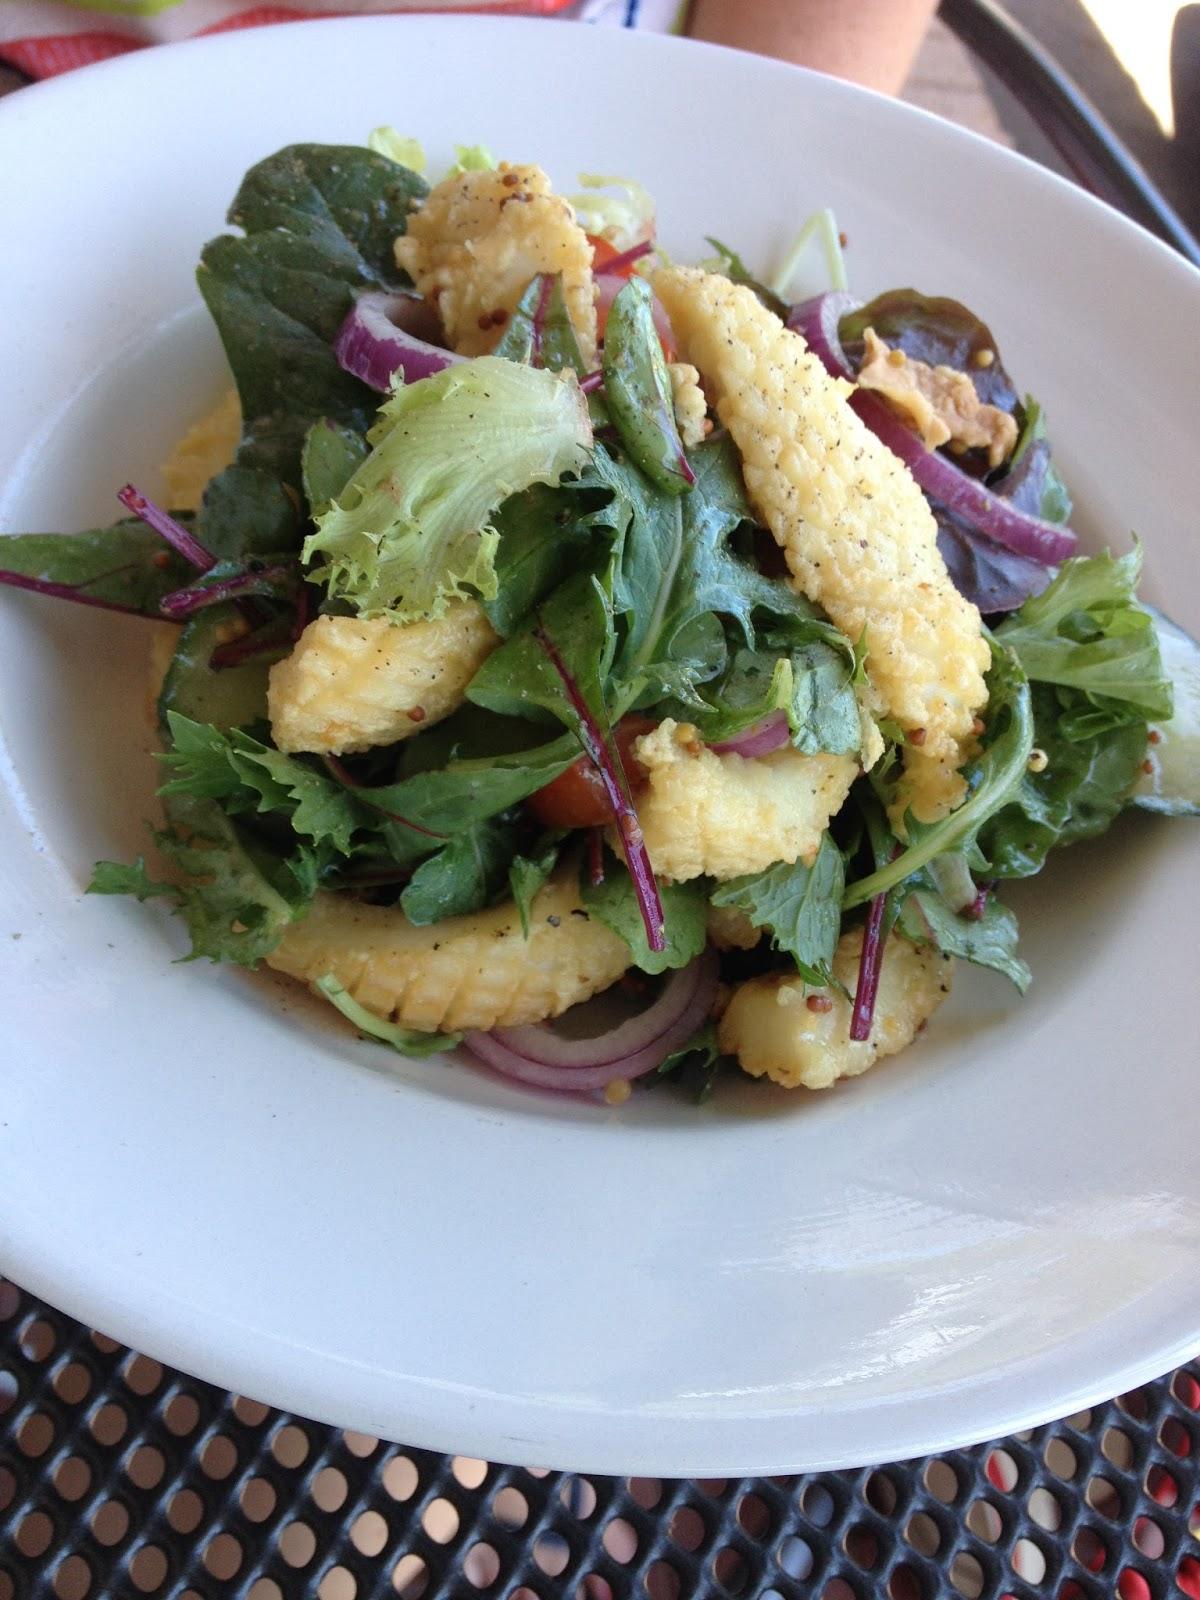 Eire, Cafe, Adelaide, Lemon pepper calamari, Clapham